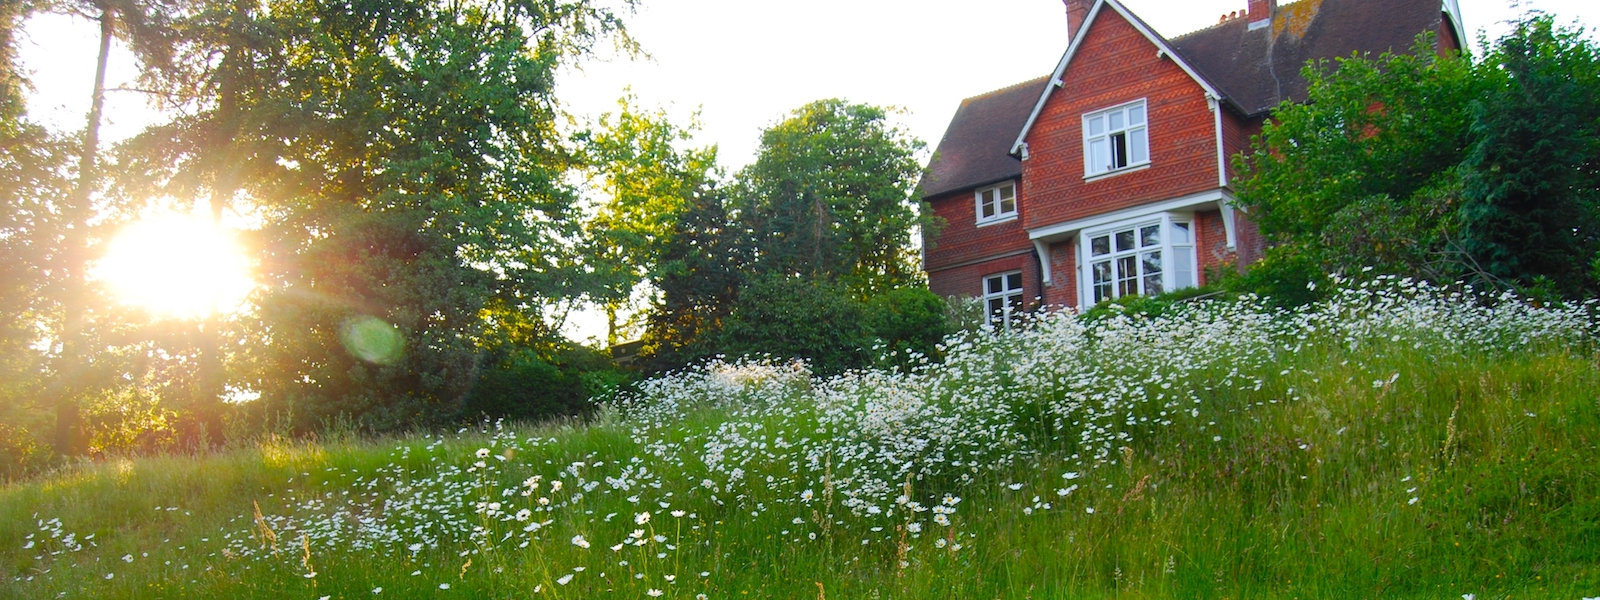 Rivendell house and garden